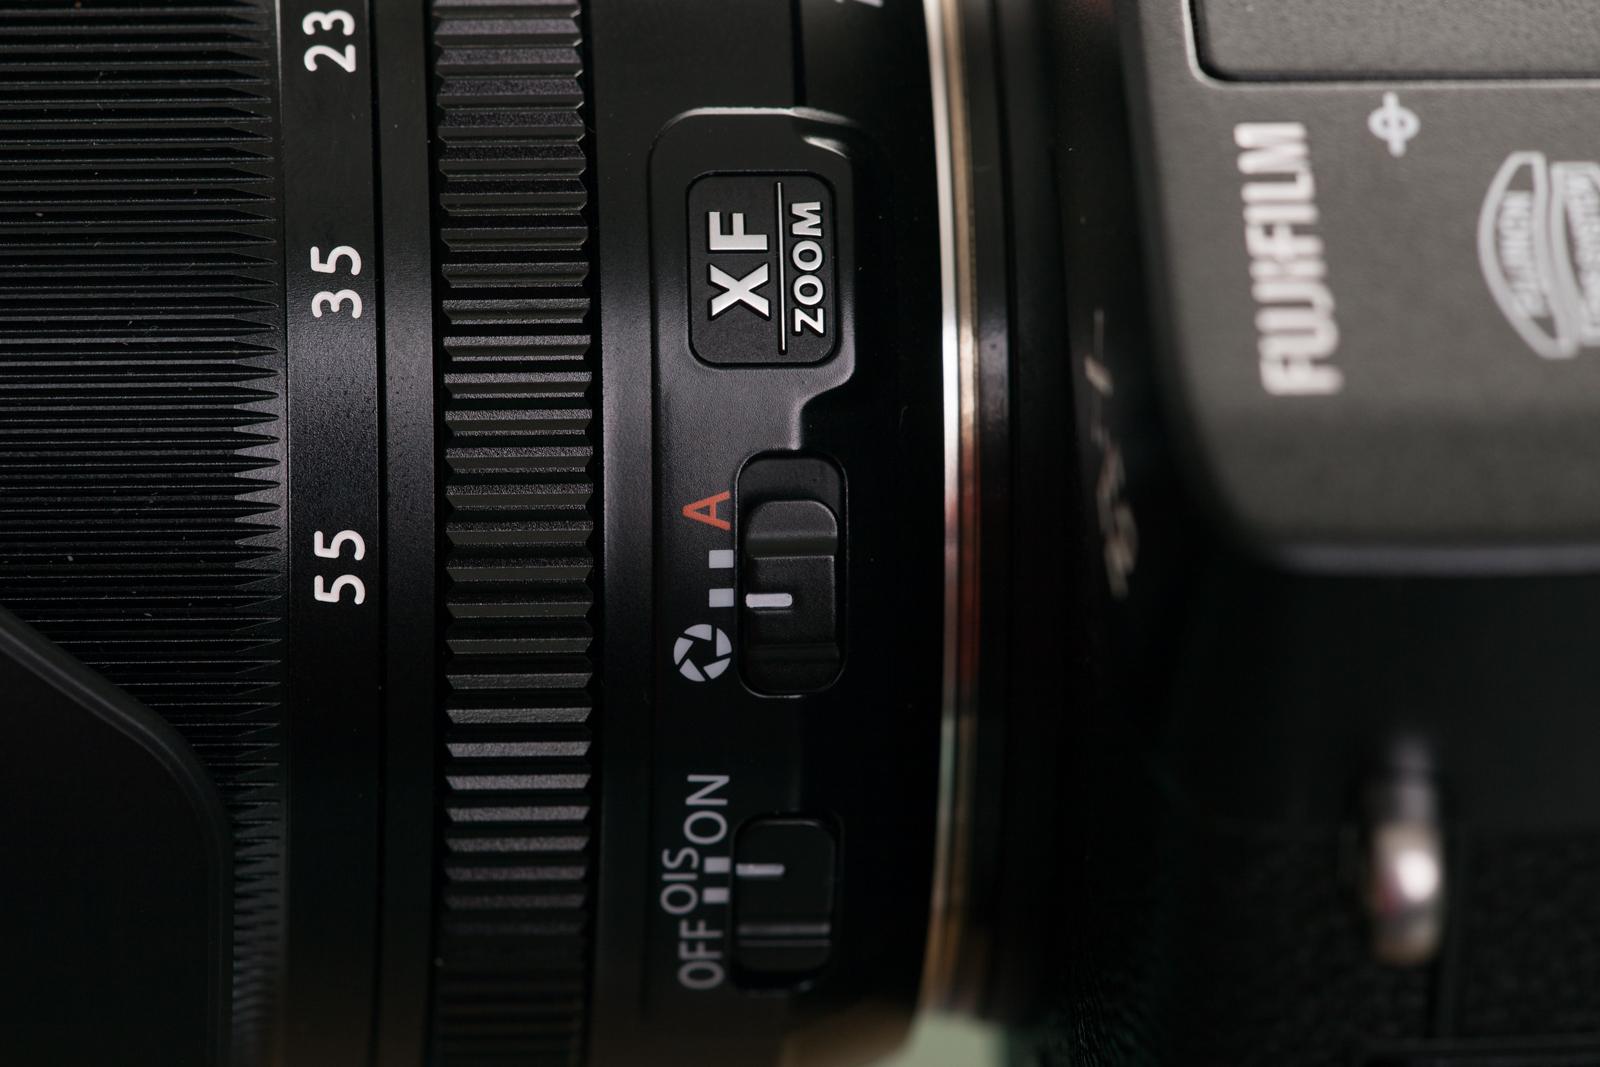 Hands On Review Fujifilm X E2 Fujinon Xf18 55mm F28 4 R Lm Ois Fuji Xf 18 Zoom Lens Aperture